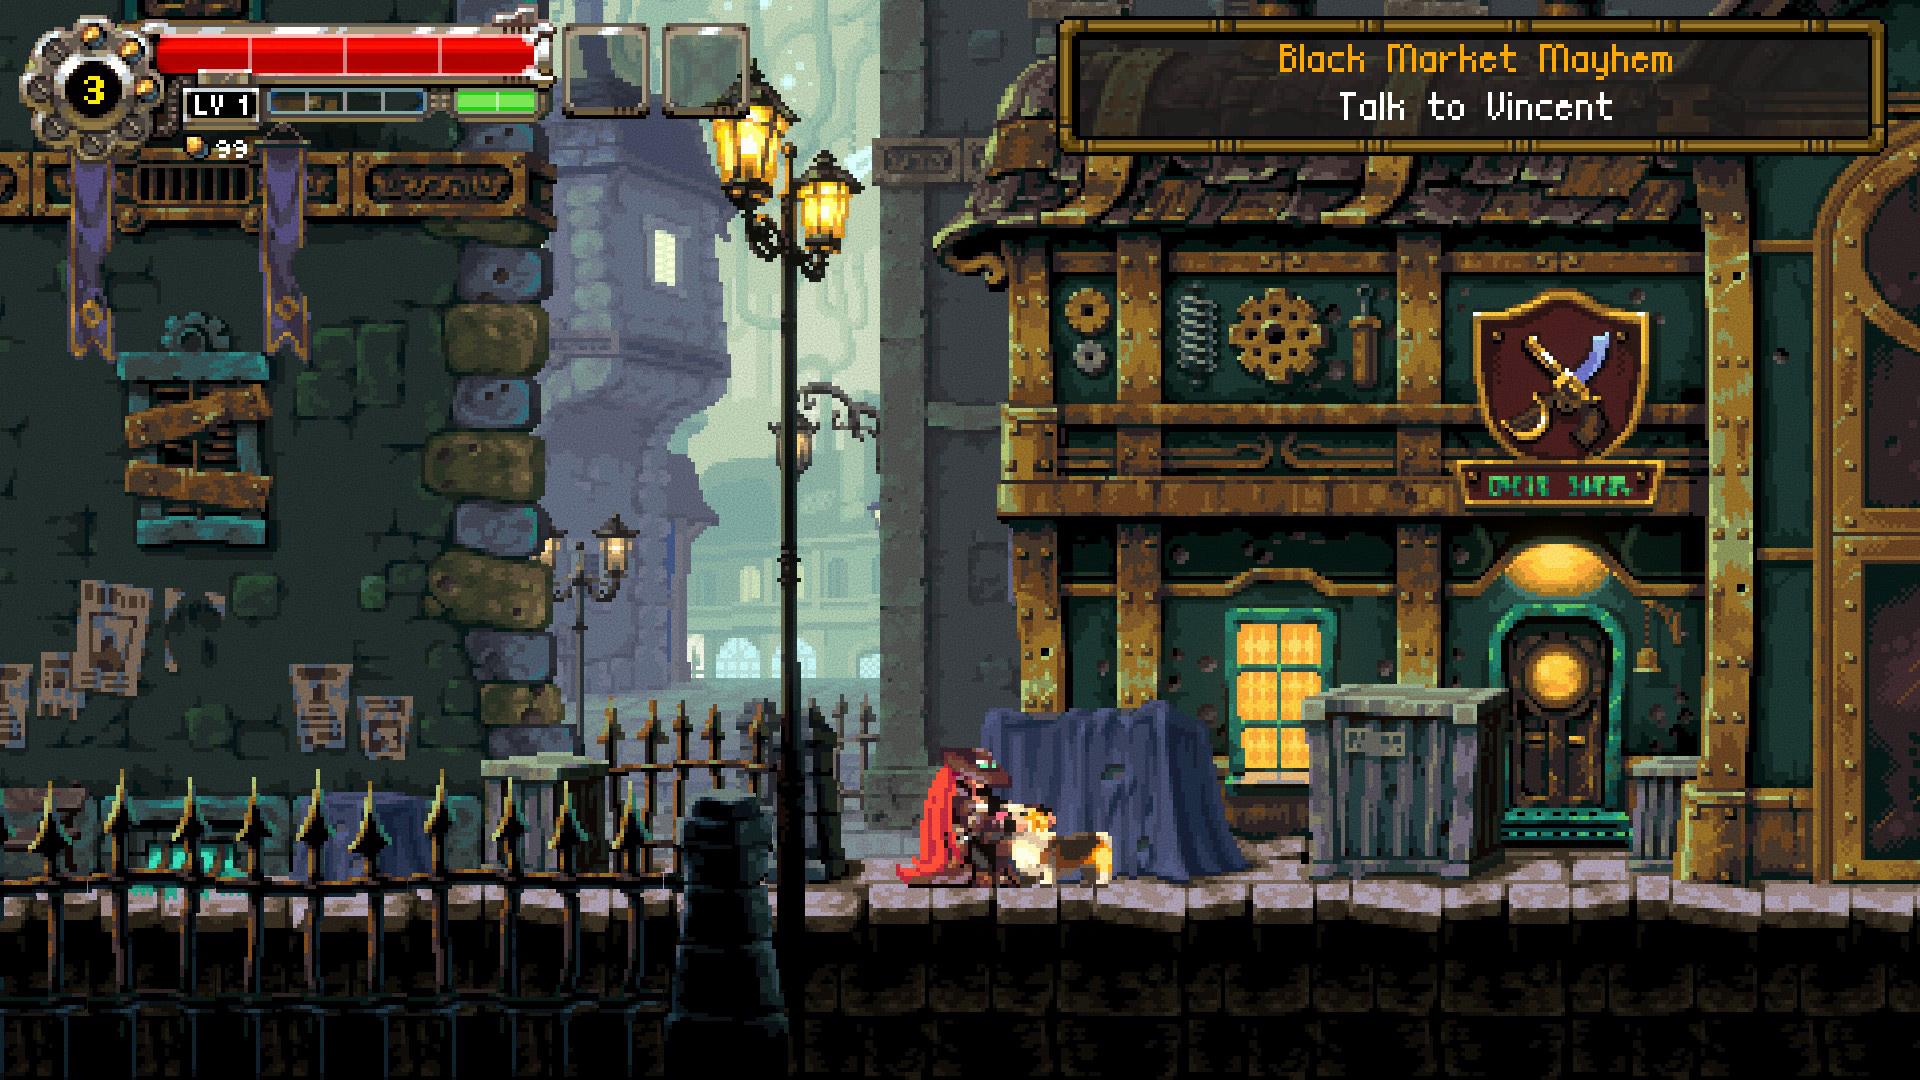 Gestalt: Steam & Cinder won me over with its first room screenshot